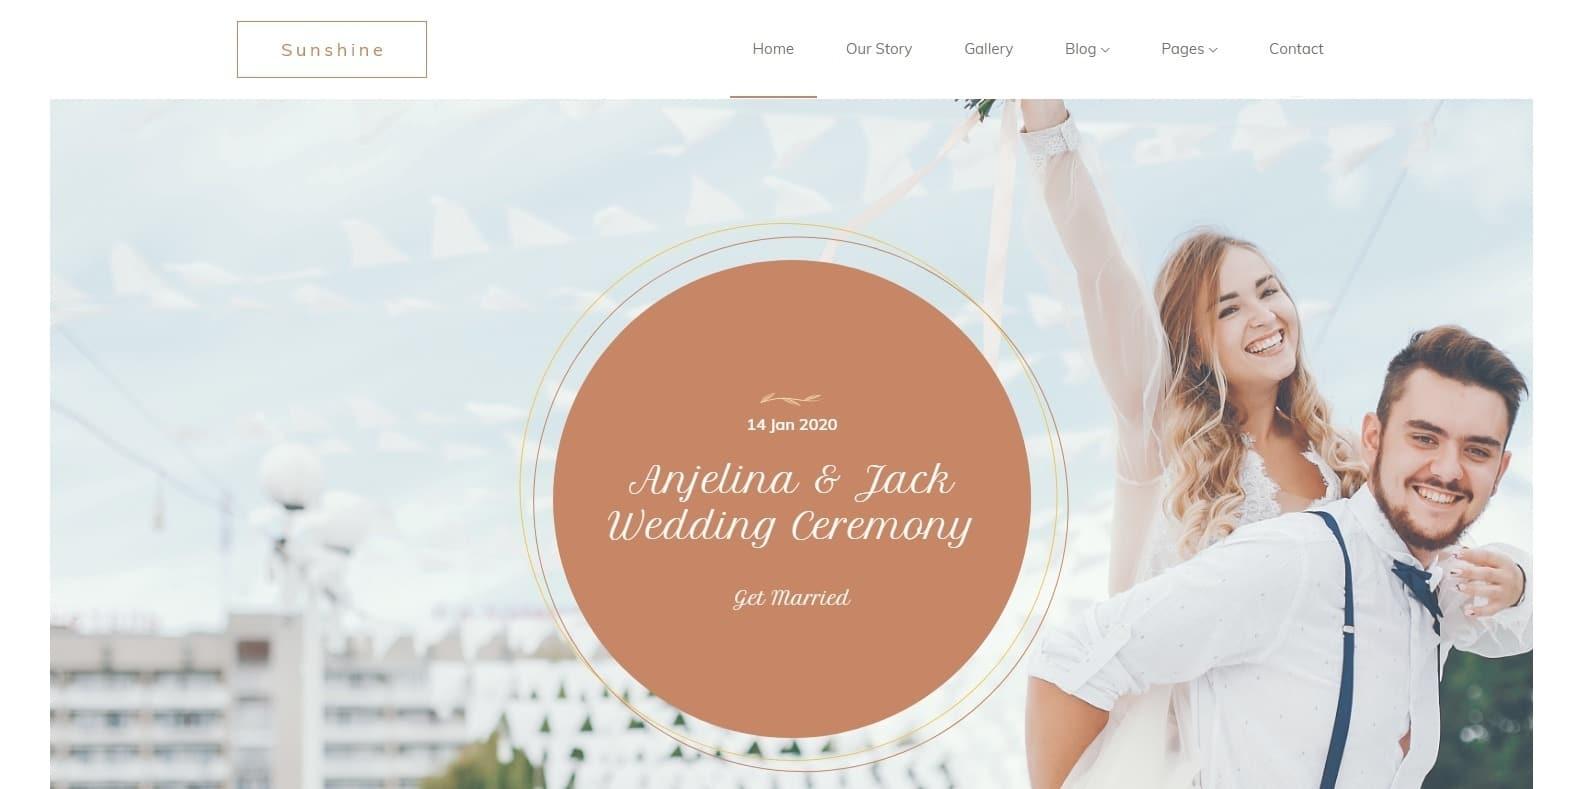 sunshine-wedding-website-template